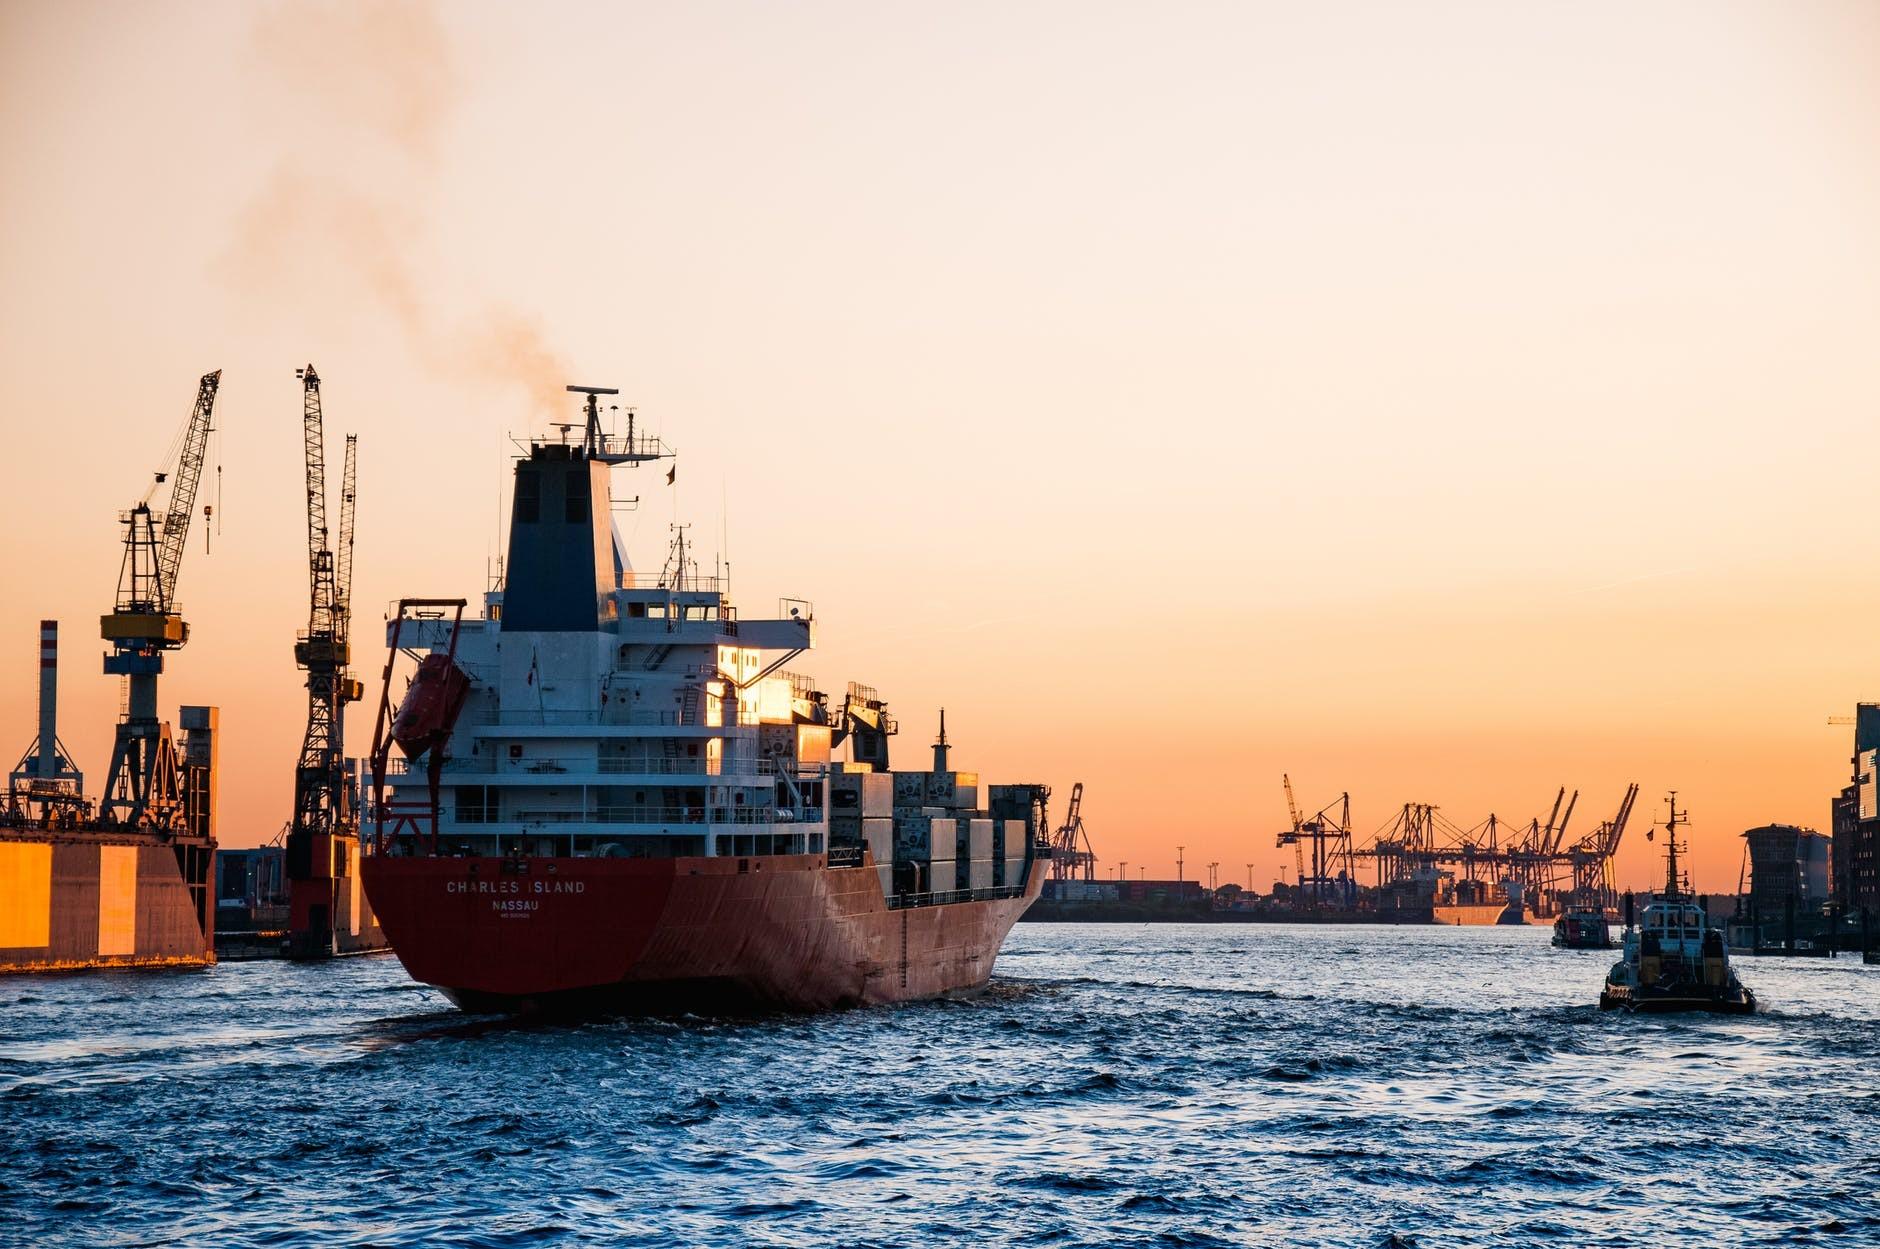 CMACGM提升其亚洲/欧洲运力